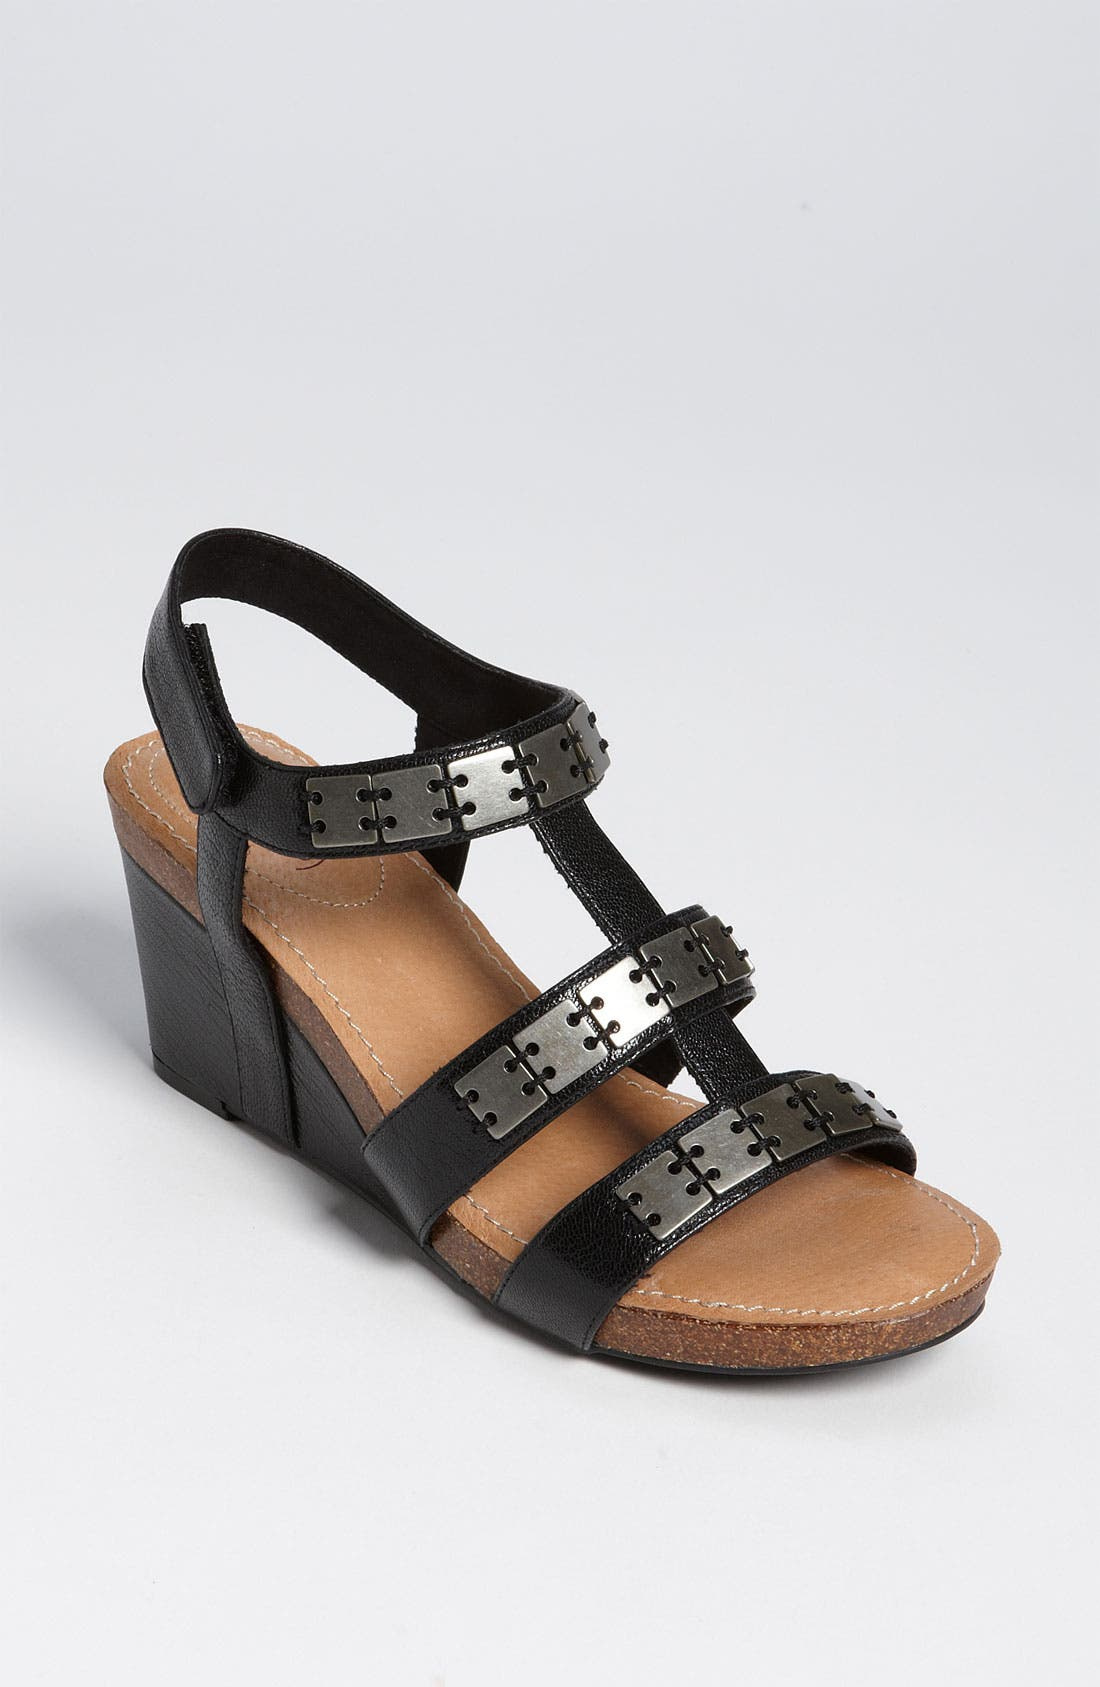 Alternate Image 1 Selected - Me Too 'Kat' Sandal